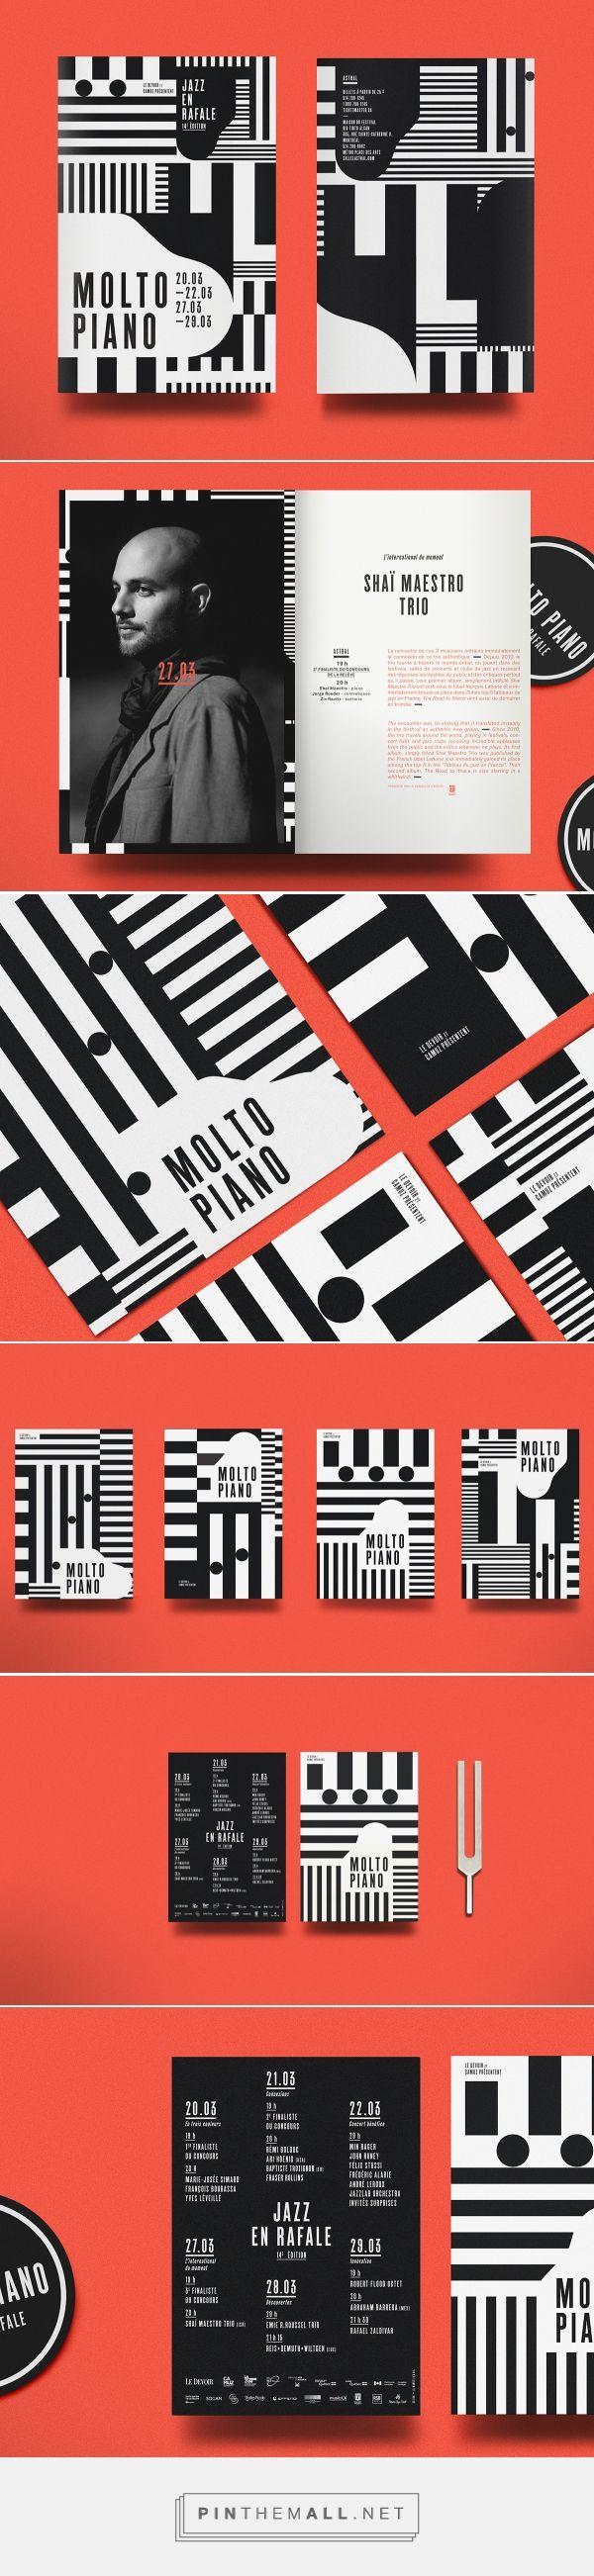 MOLTO PIANO - Jazz en rafale 2014 on Behance | Fivestar Branding – Design and Branding Agency & Inspiration Gallery